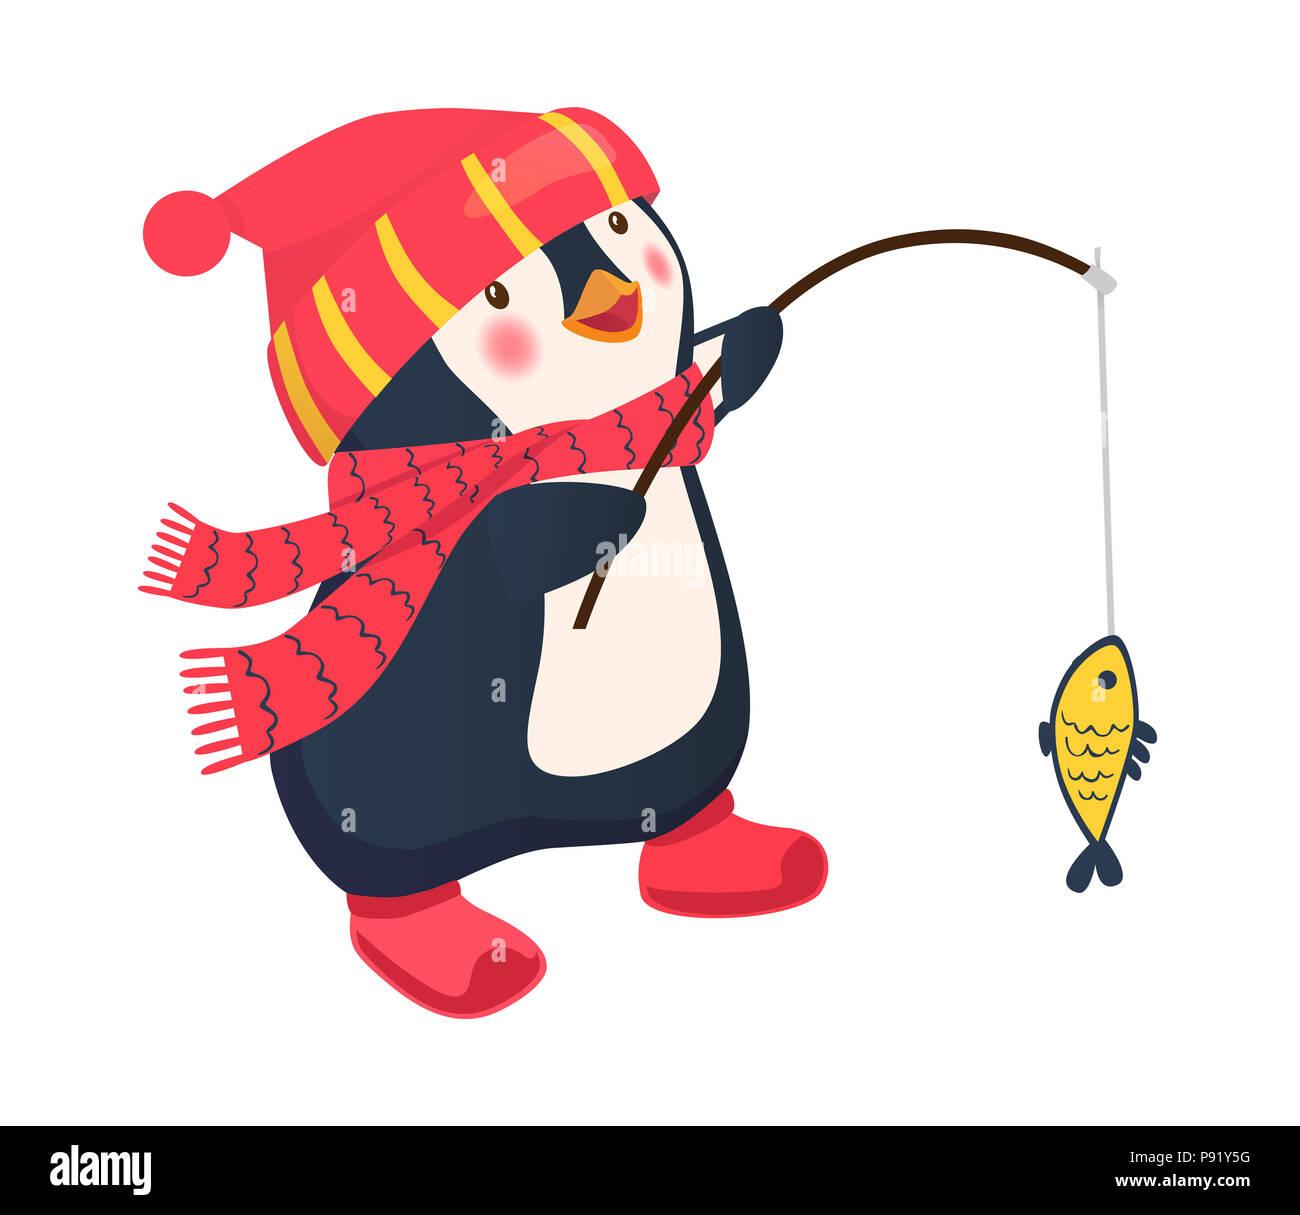 Cartoon Character Fish Stock Photos & Cartoon Character Fish Stock ...